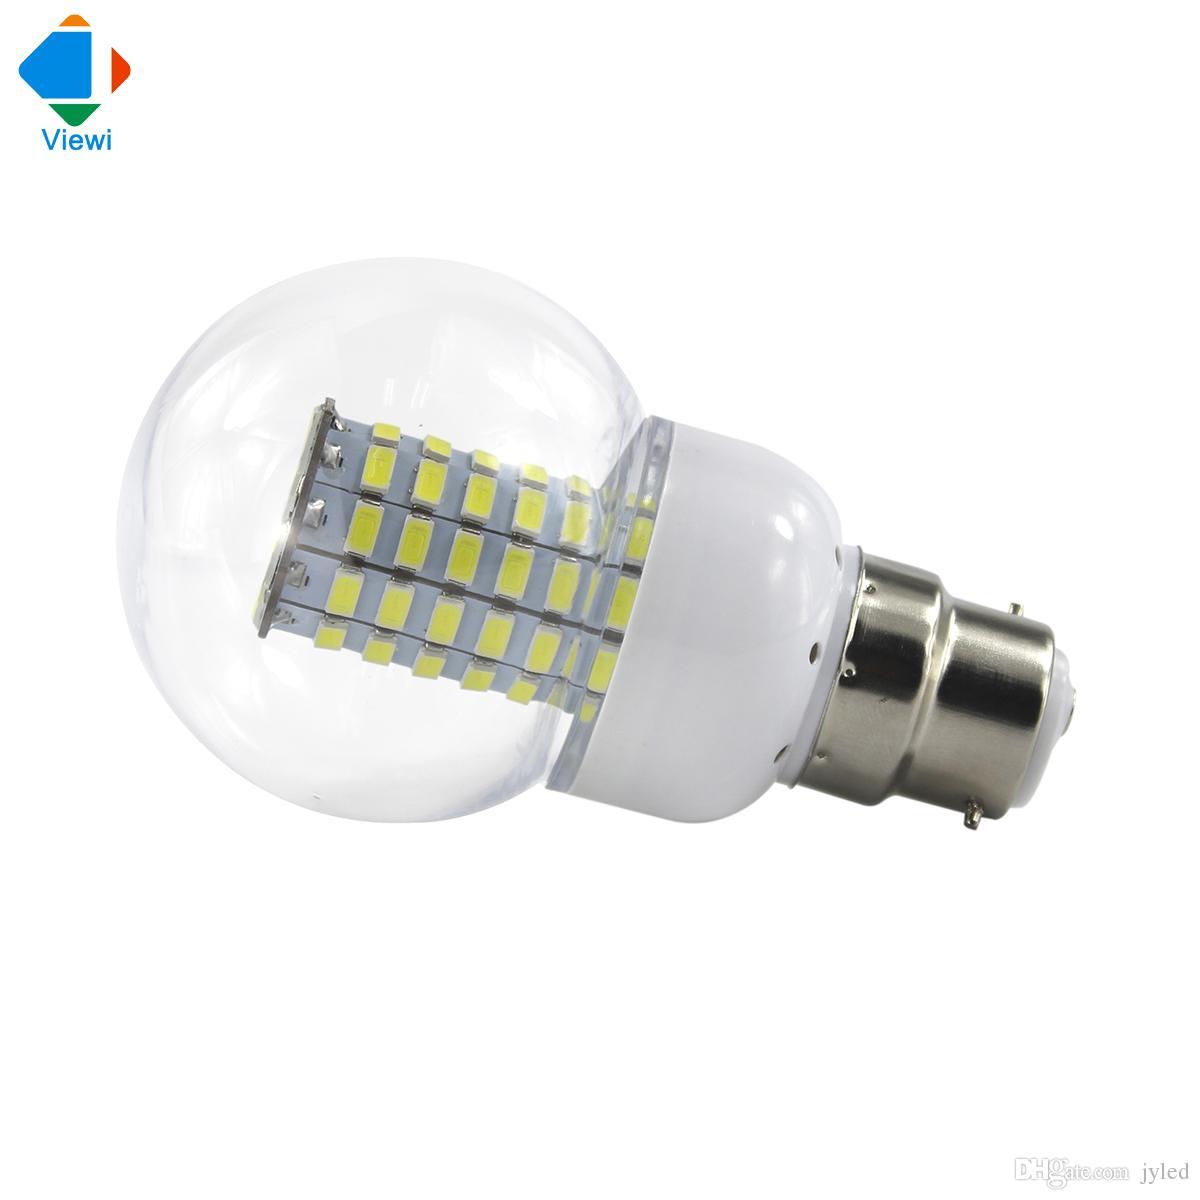 https://www.dhresource.com/0x0s/f2-albu-g5-M00-30-09-rBVaJFjs06uANRU1AATpbBnrPTg409.jpg/5x-12v-led-bulb-b22-corn-light-220v-smd5730.jpg